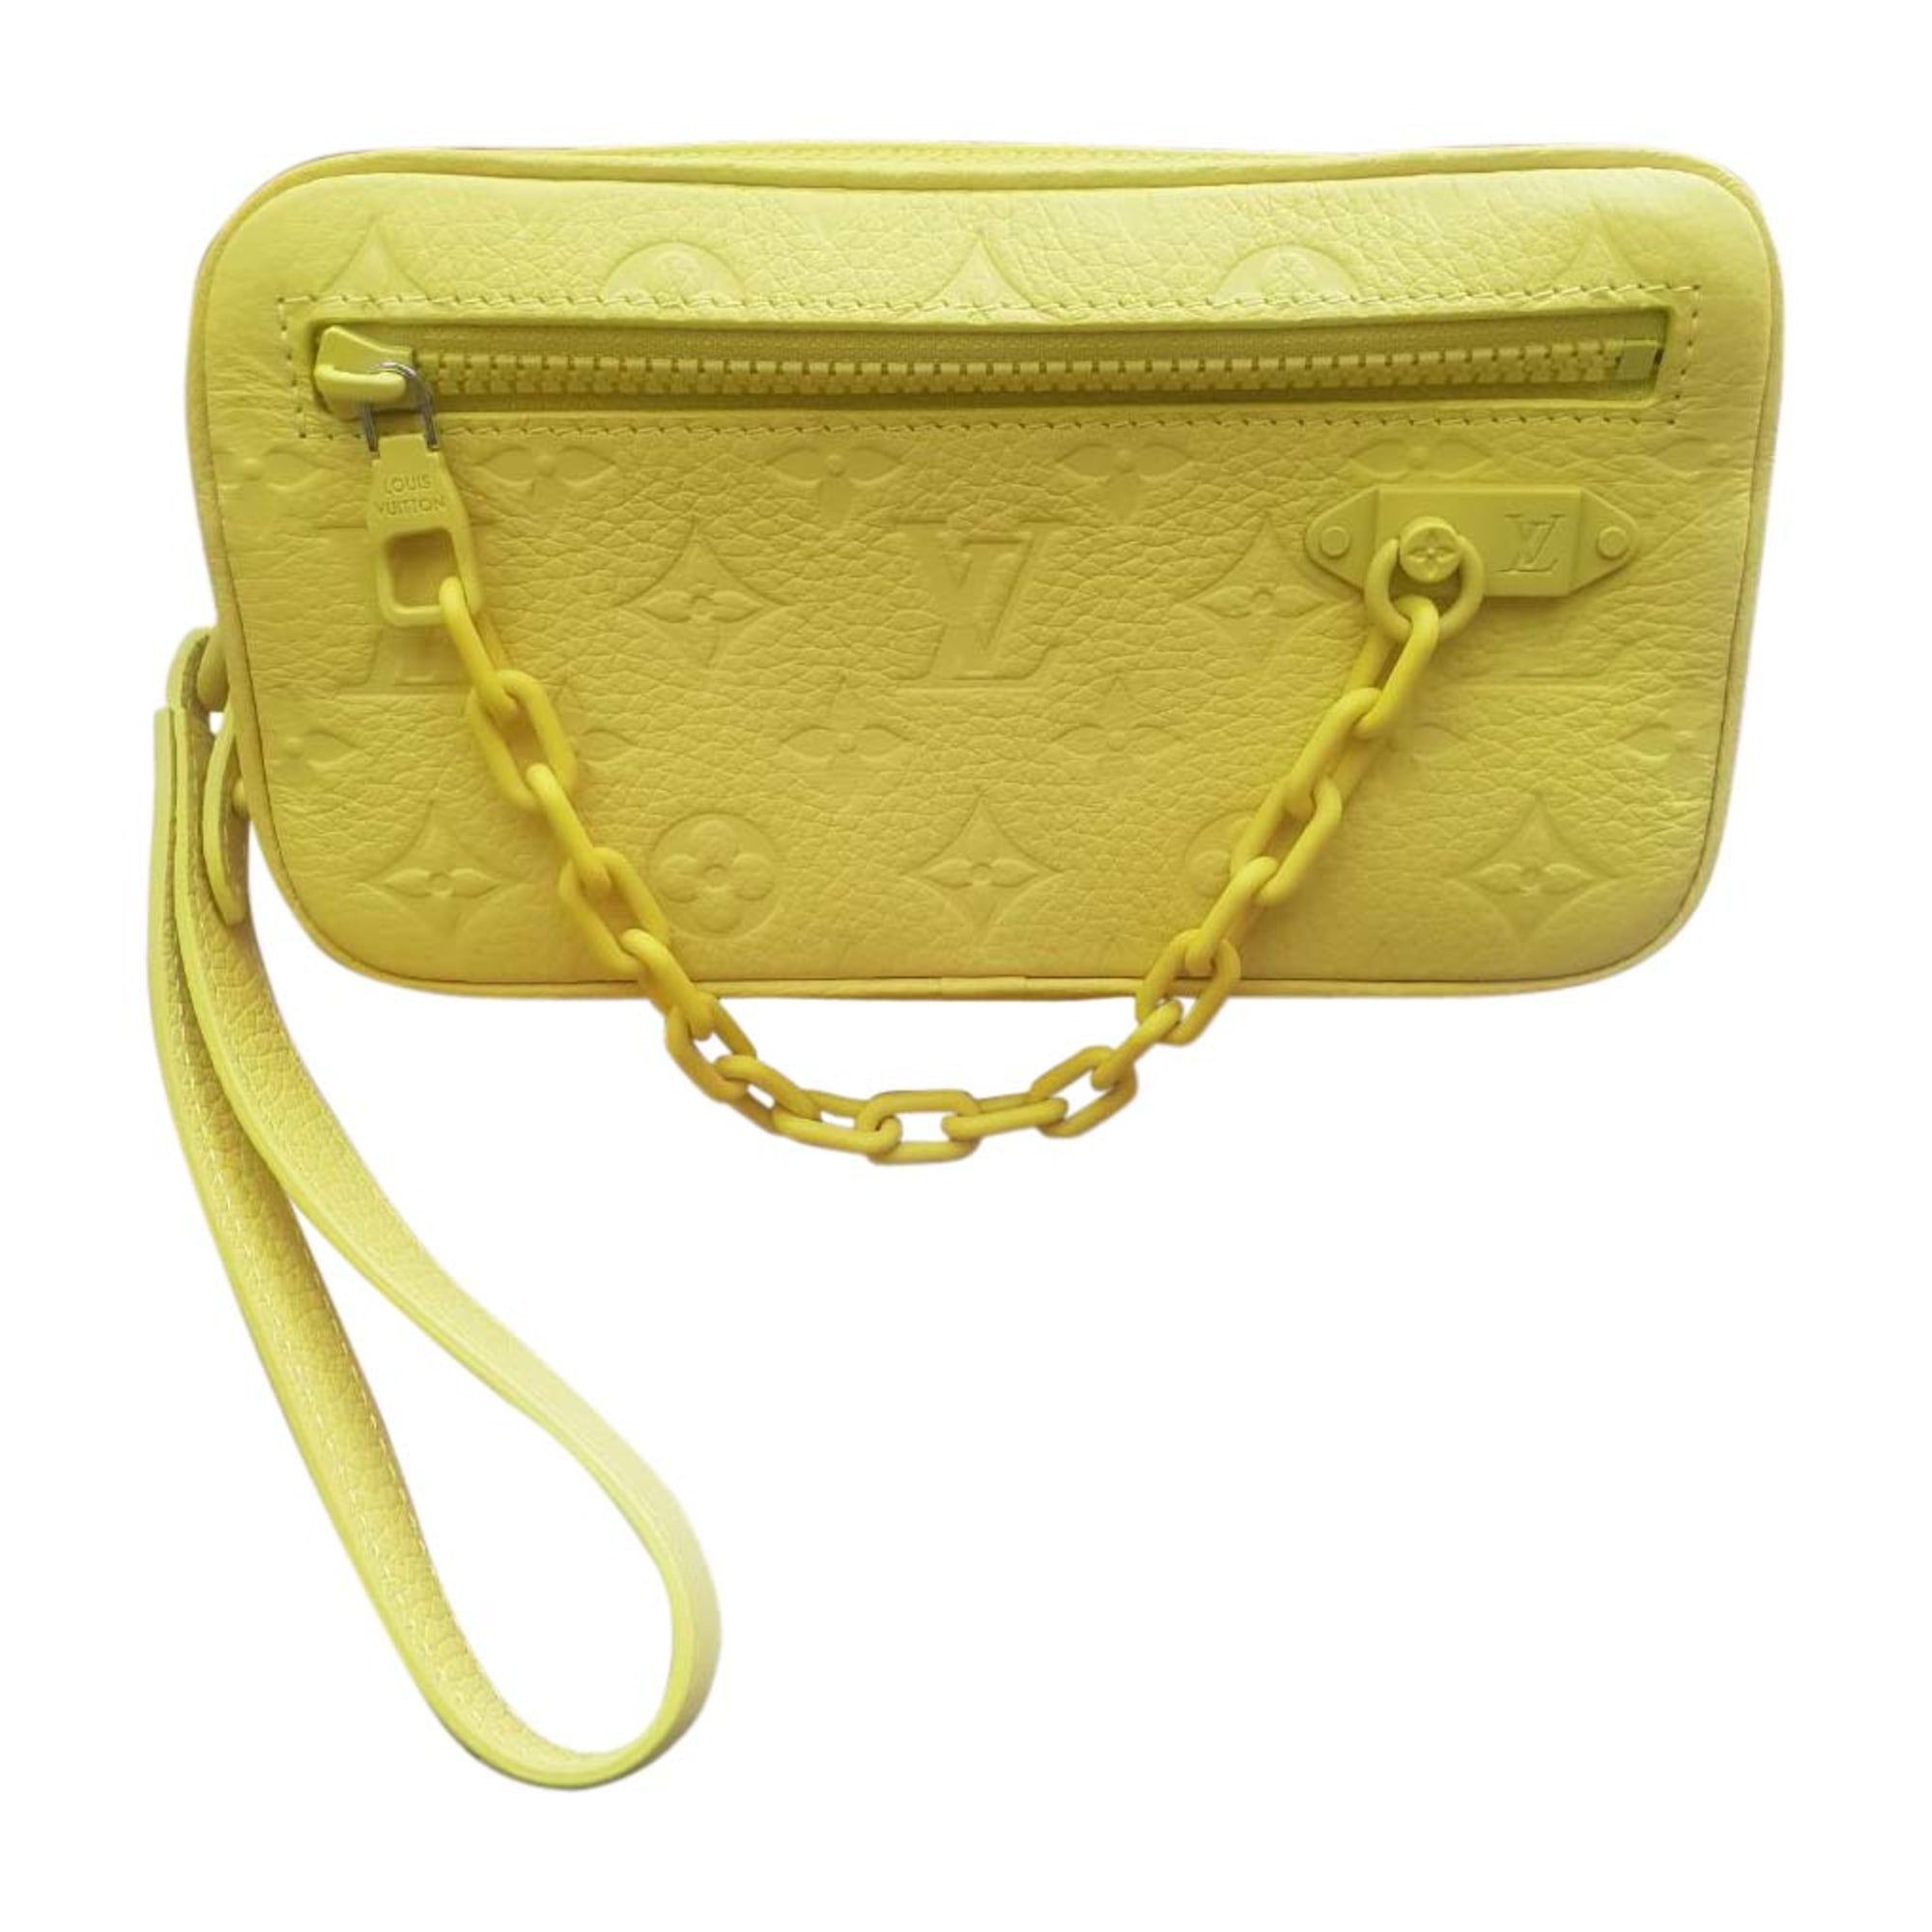 Small Messenger Bag LOUIS VUITTON Yellow